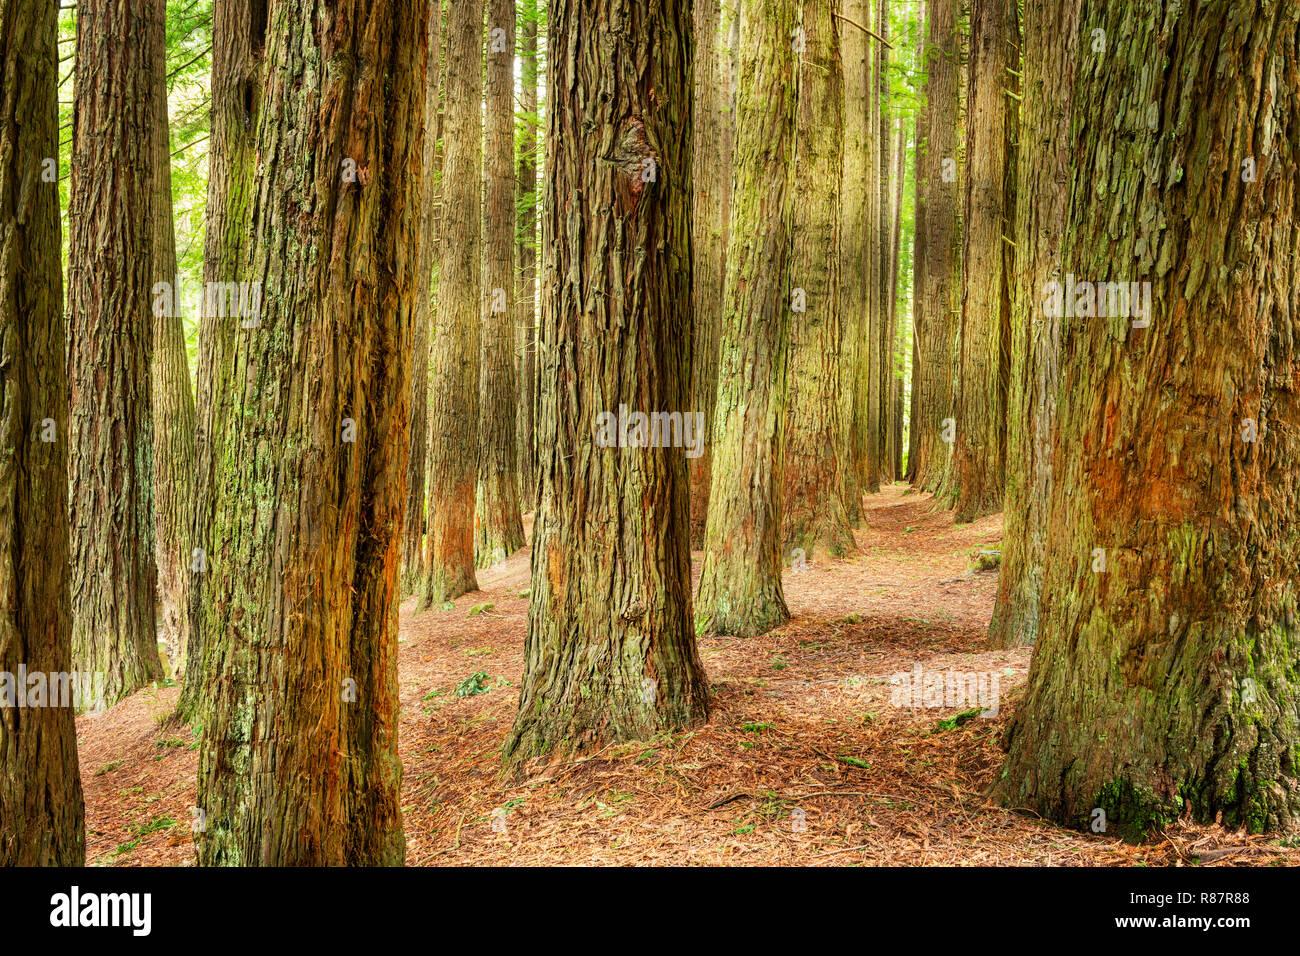 Californian Redwoods in the Otway Ranges. - Stock Image